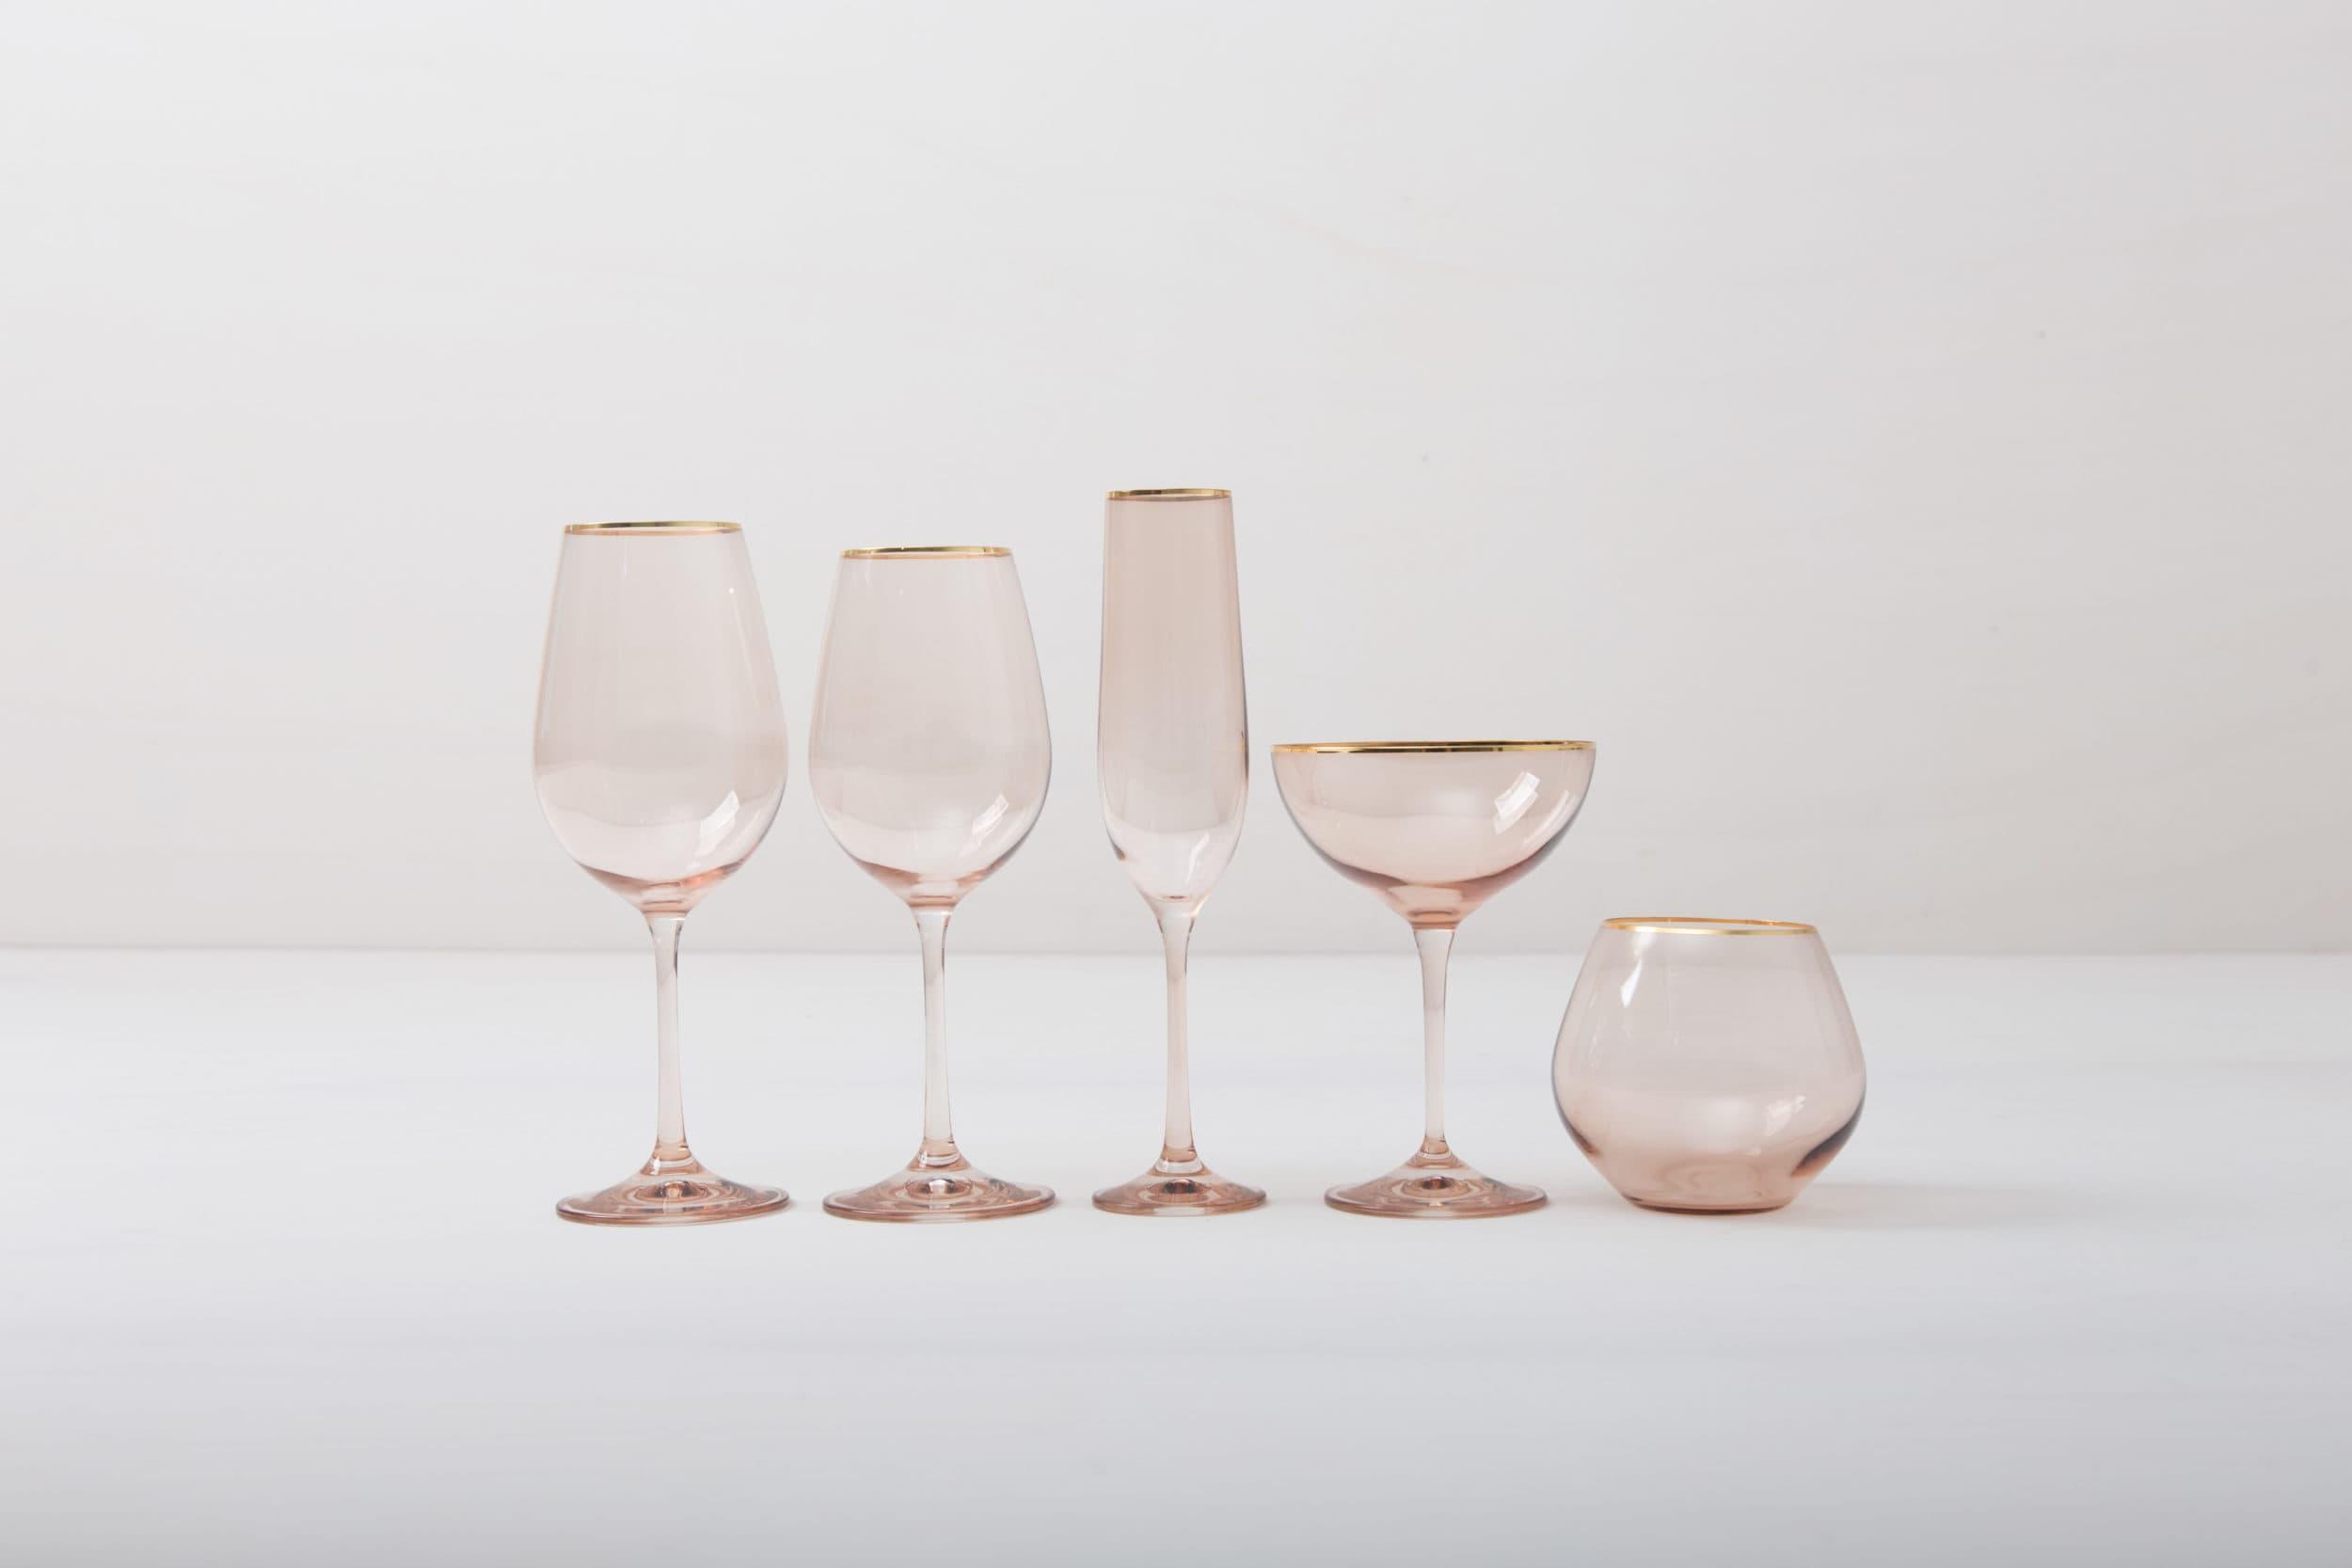 Wasserbecher, Wasserglas mit Goldrand mieten, Berlin, Hamburg, Köln